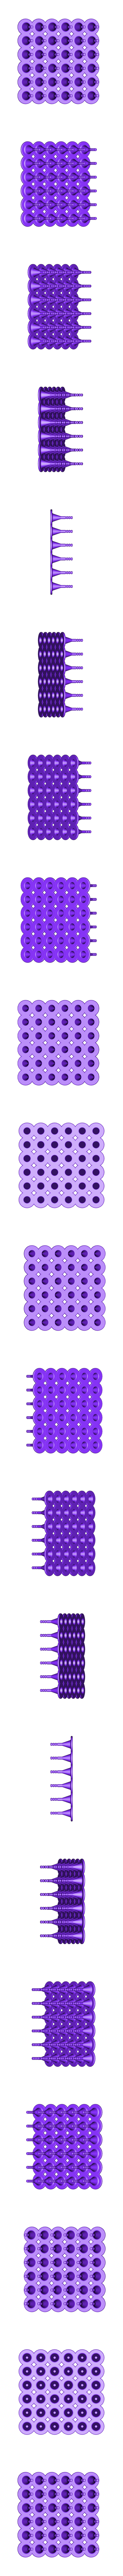 GeoBoard6x6_B.stl Download free STL file Geoboard, Geometric Board, Cartesian, Isometic, Circular, Geometry, Math • 3D printer object, LGBU